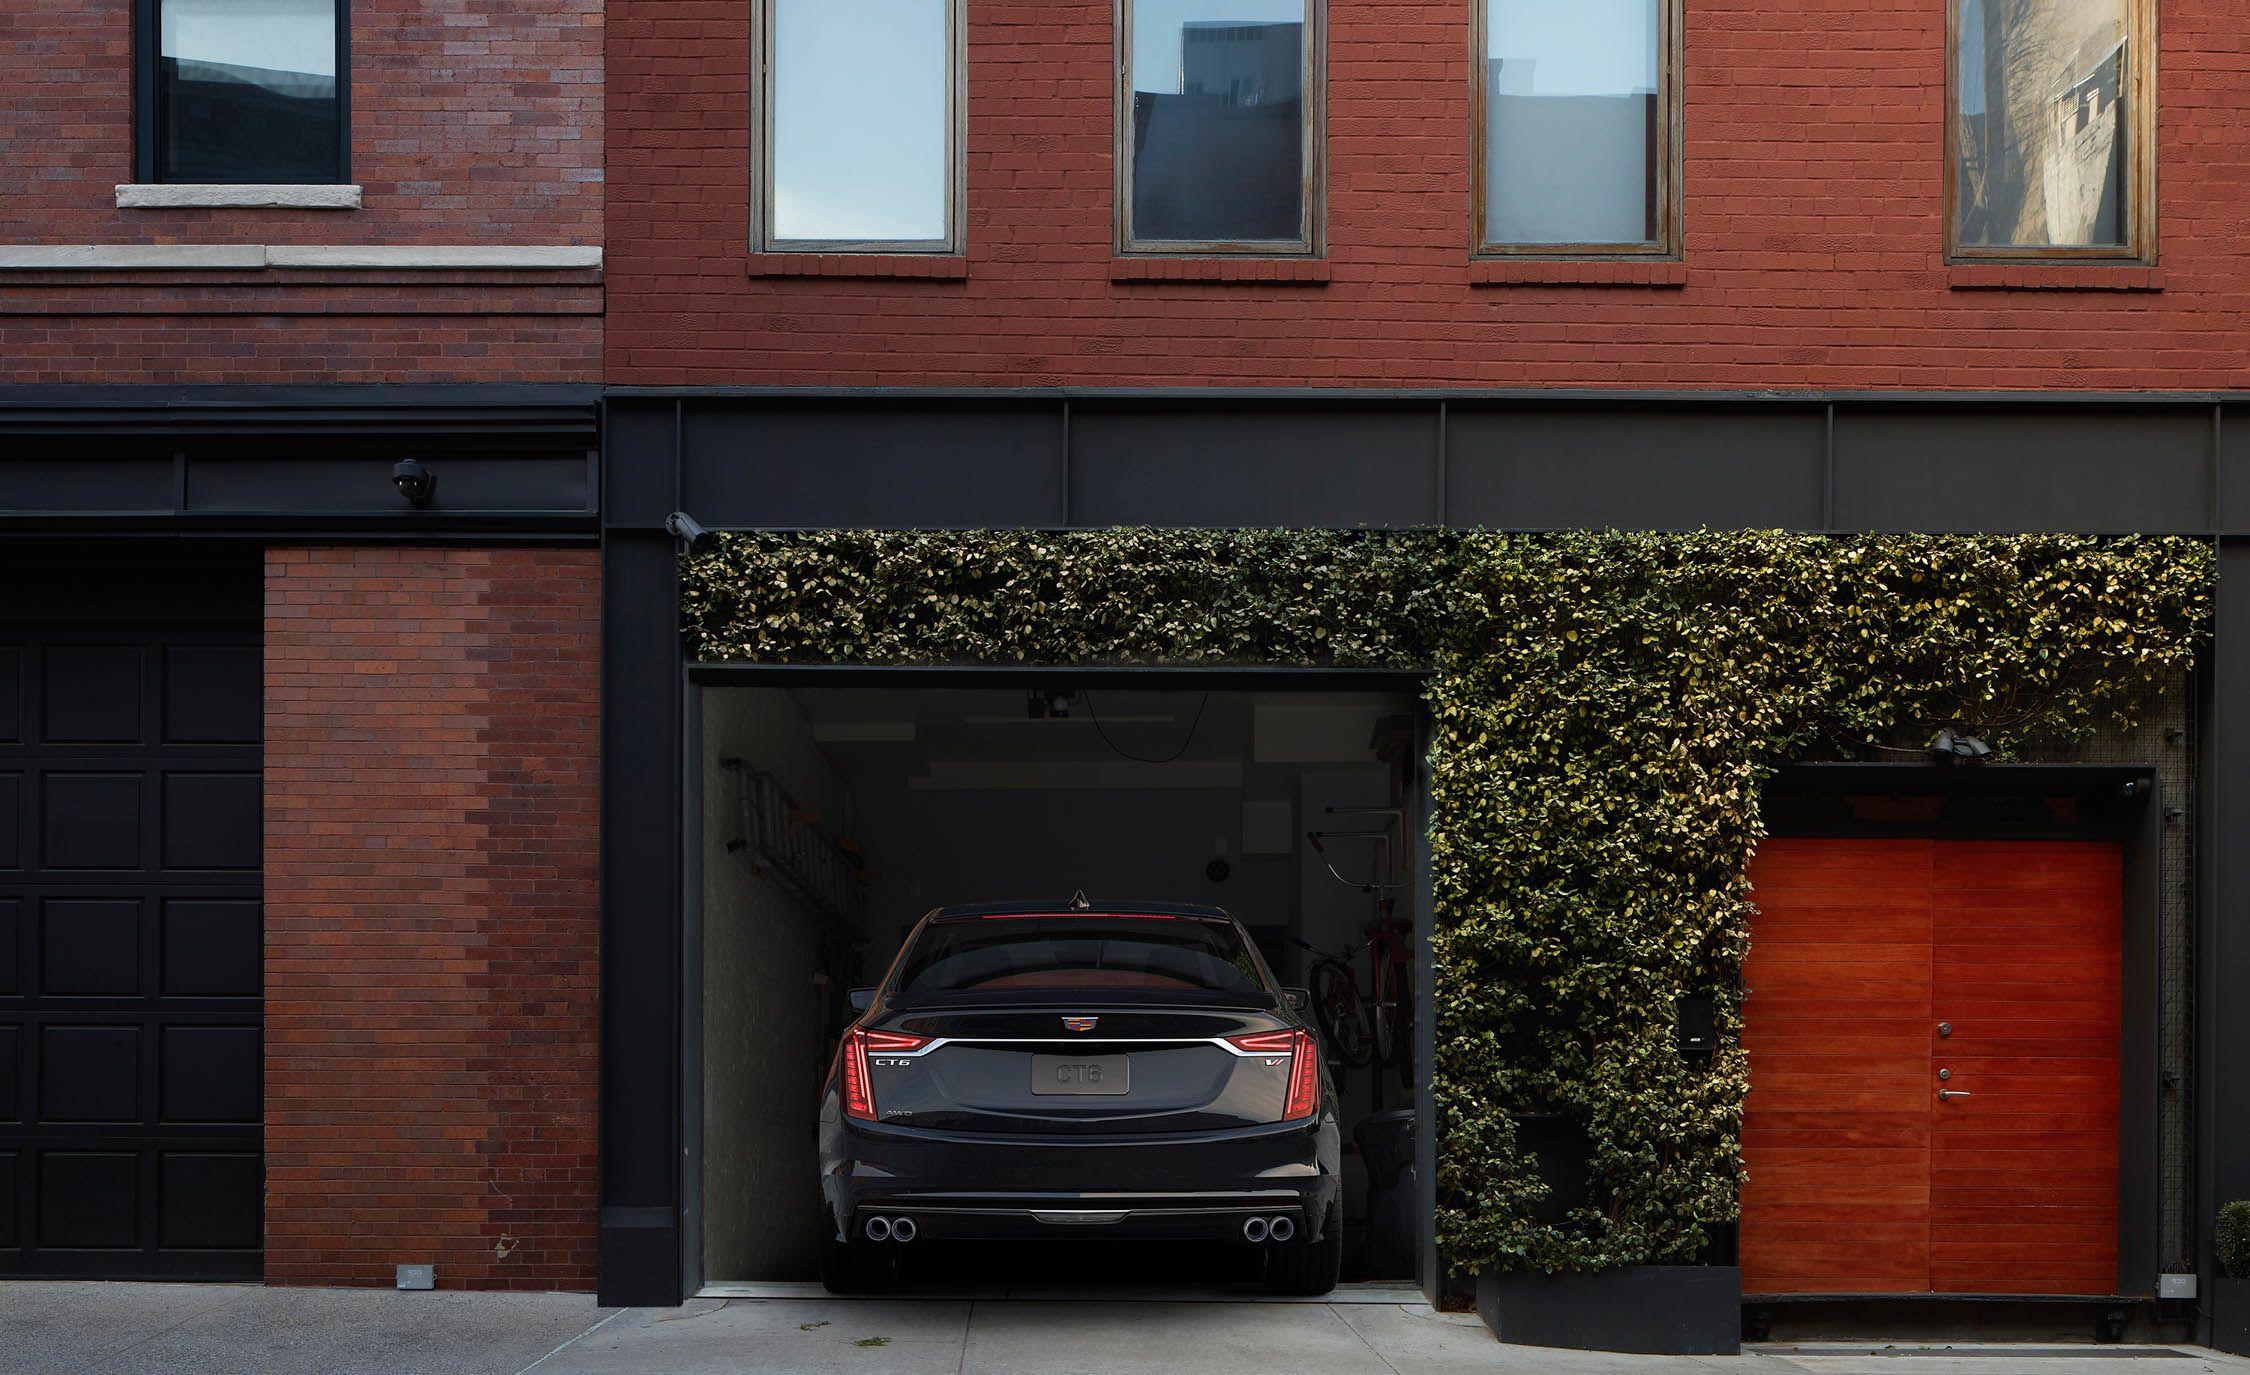 2019 Cadillac CT6 V-Sport Rear Wallpapers (5)